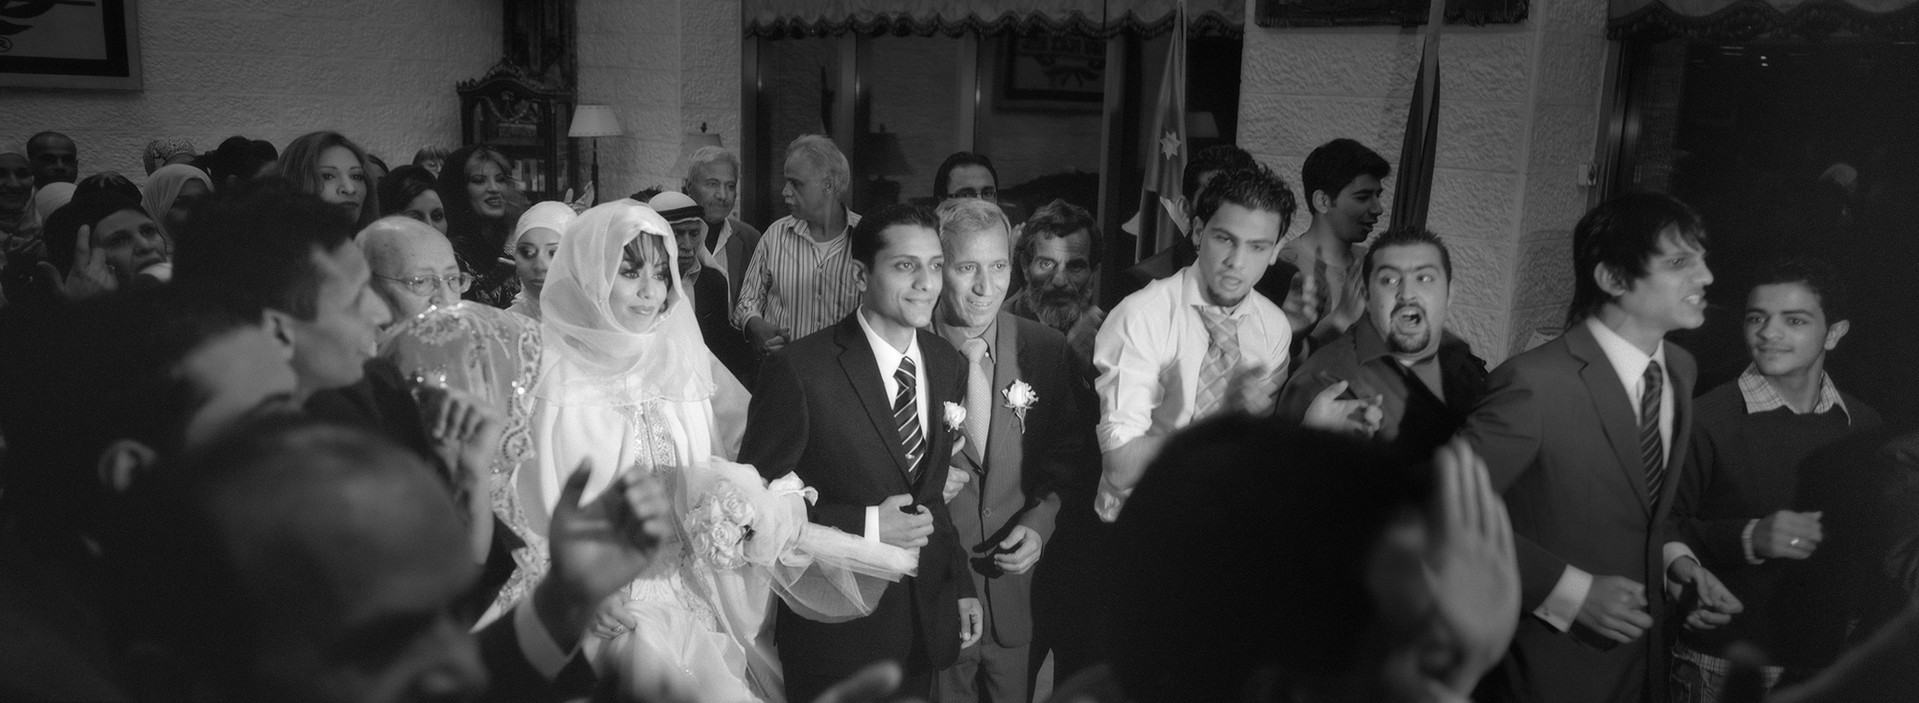 Jordanian Wedding, Amman, Jordan 2009